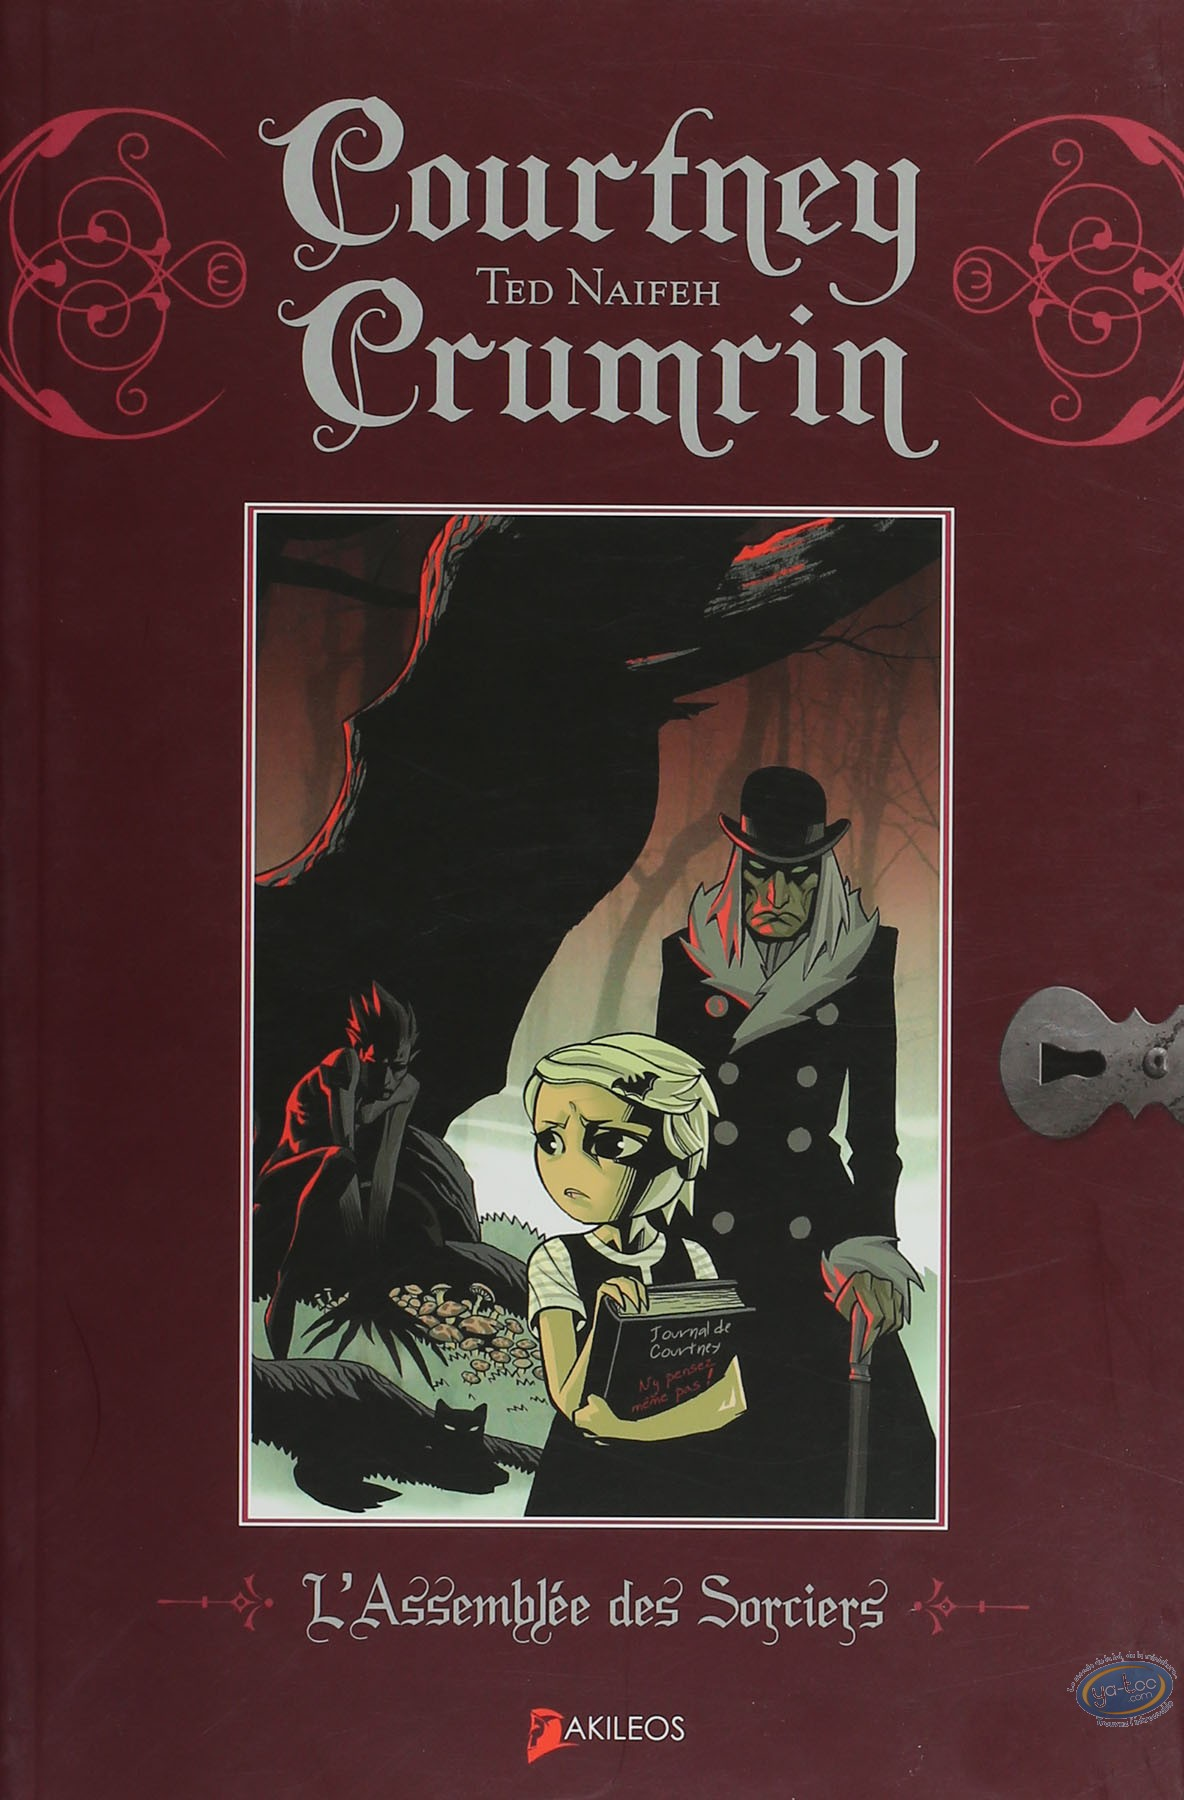 Reduced price European comic books, Courtney Crumrin : L'assemblée des Sorciers